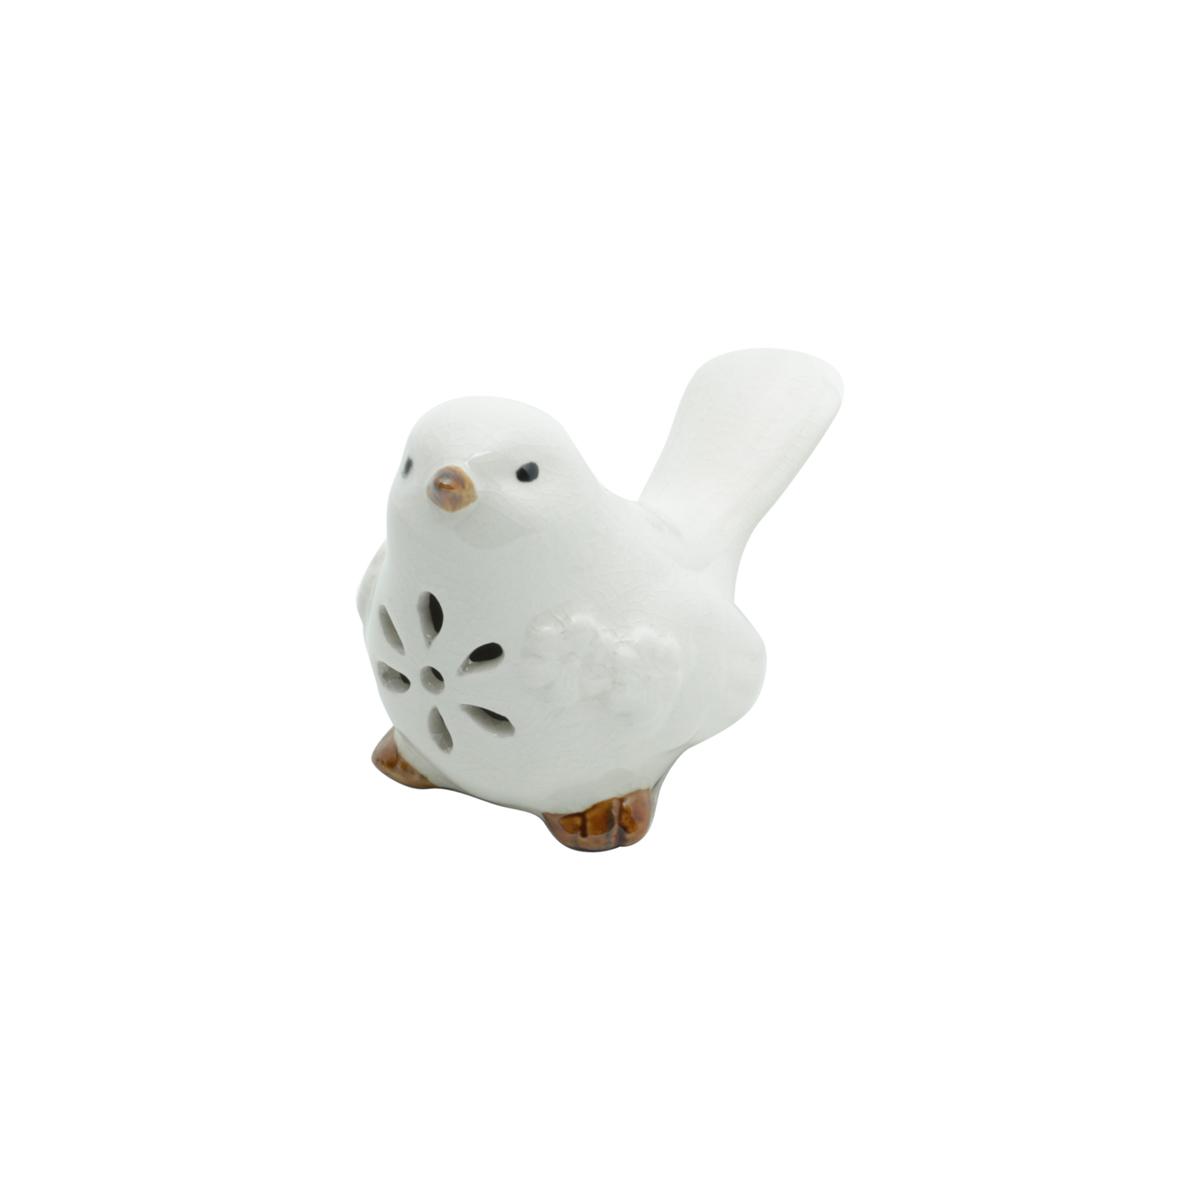 Pássaro decorativo cerâmica branco 10x5x6x8,5cm Lyor